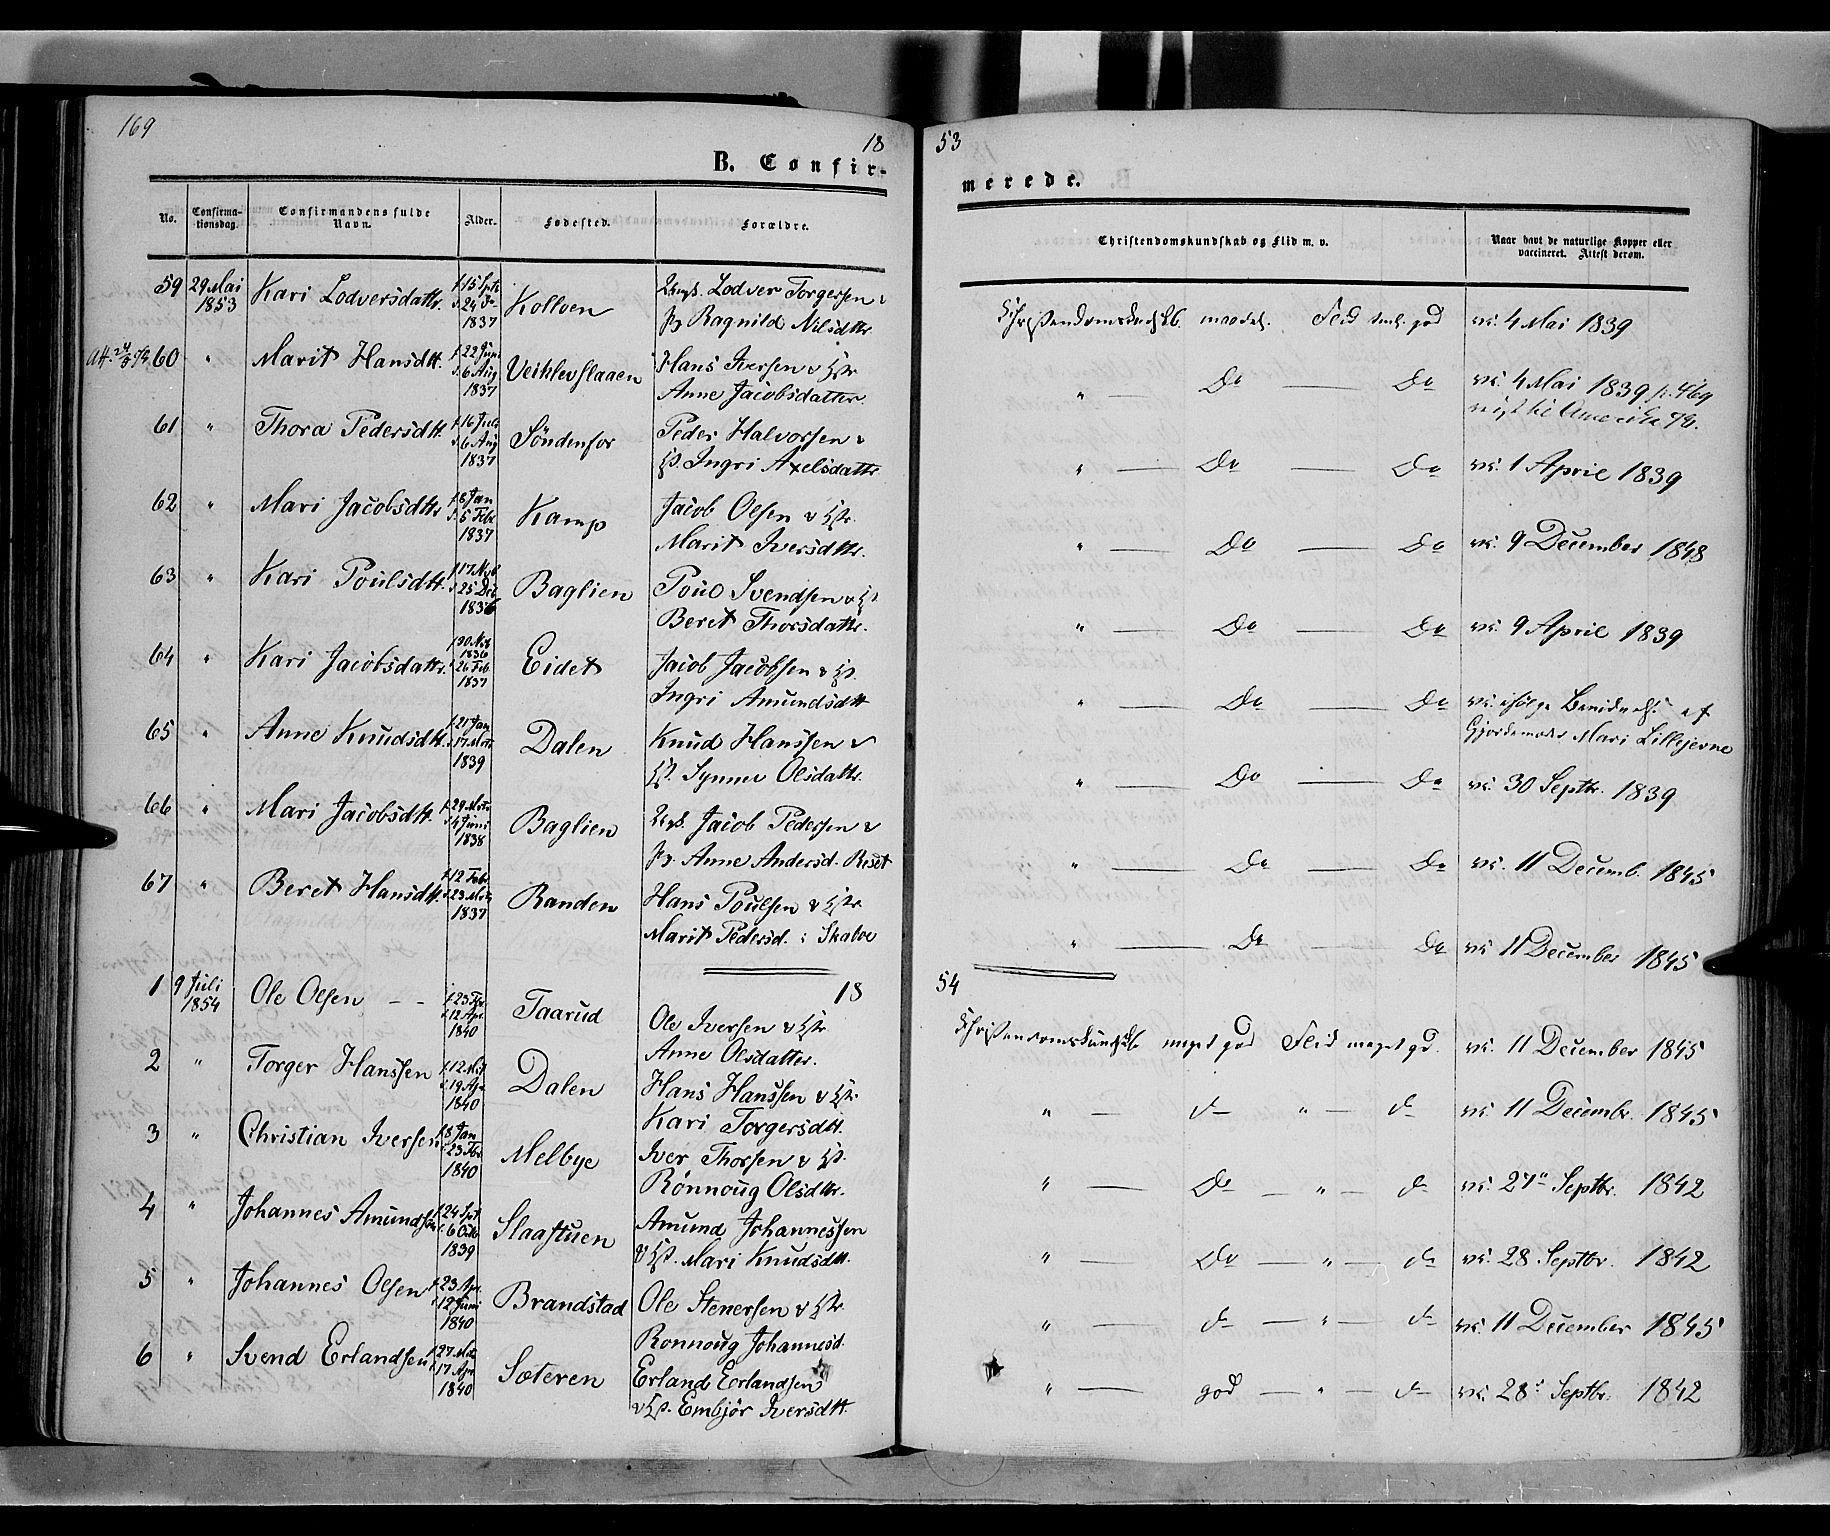 SAH, Nord-Fron prestekontor, Ministerialbok nr. 1, 1851-1864, s. 169